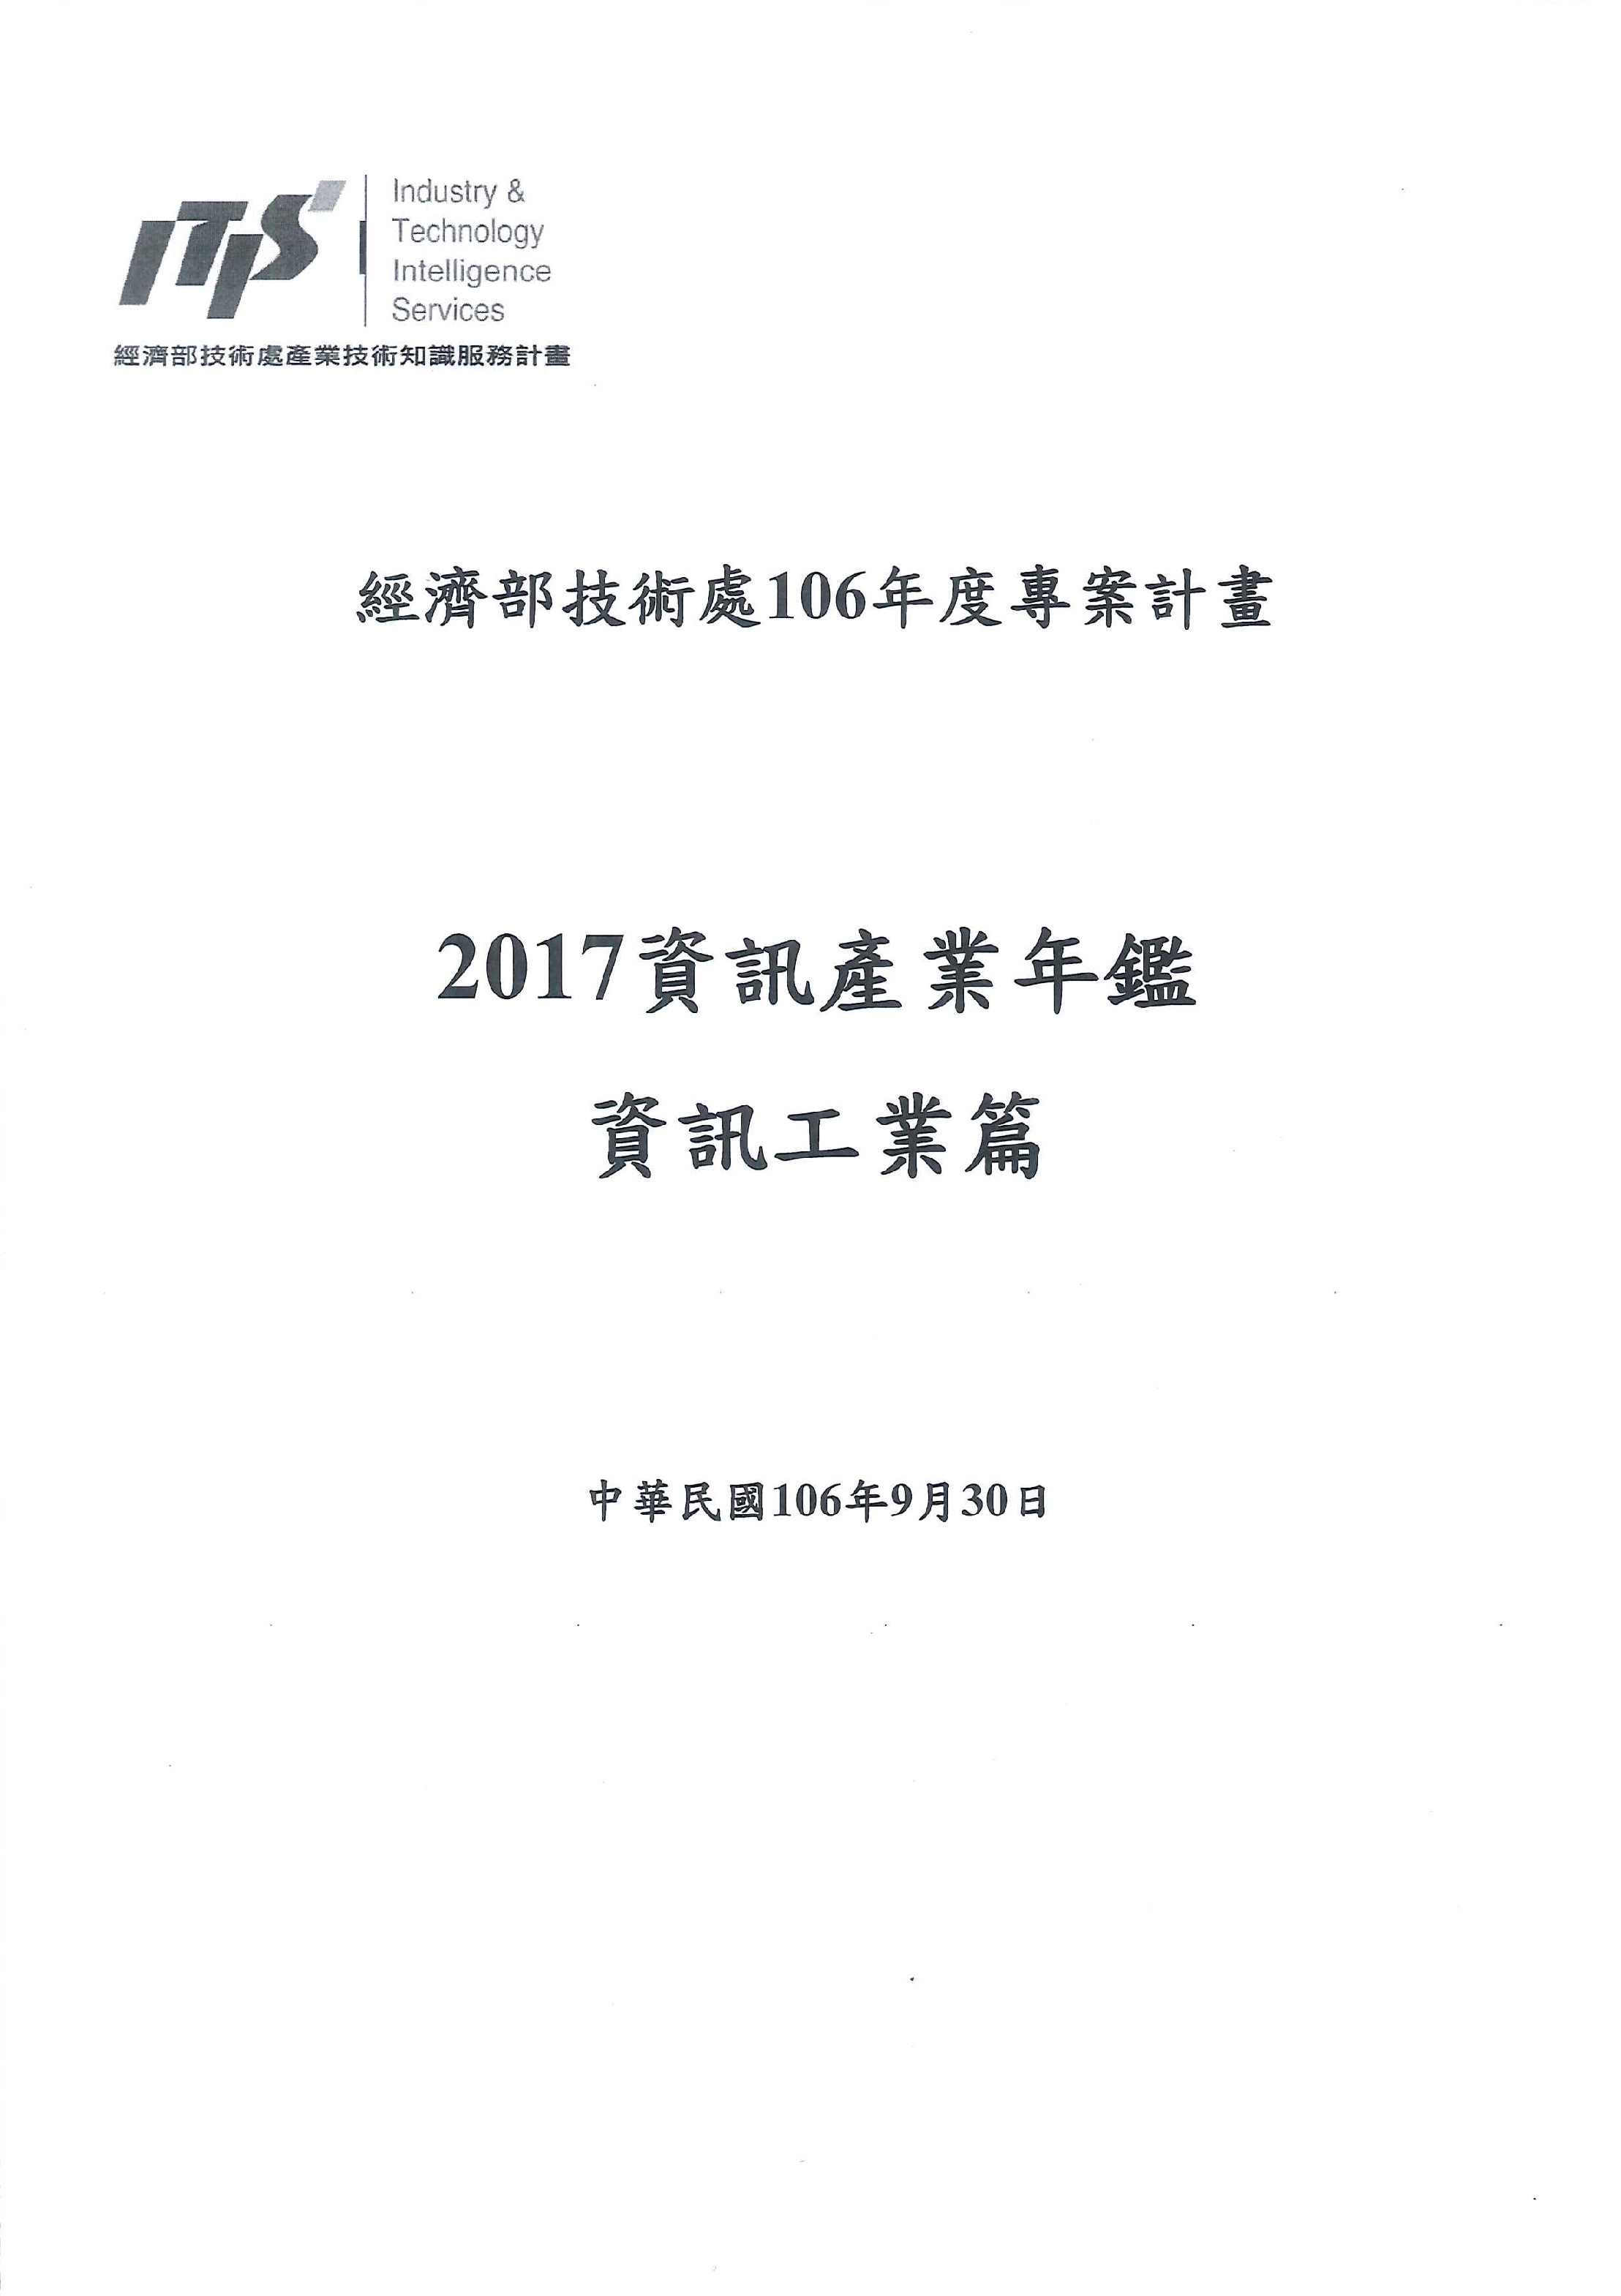 資訊產業年鑑.資訊工業篇=IT services industry yearbook